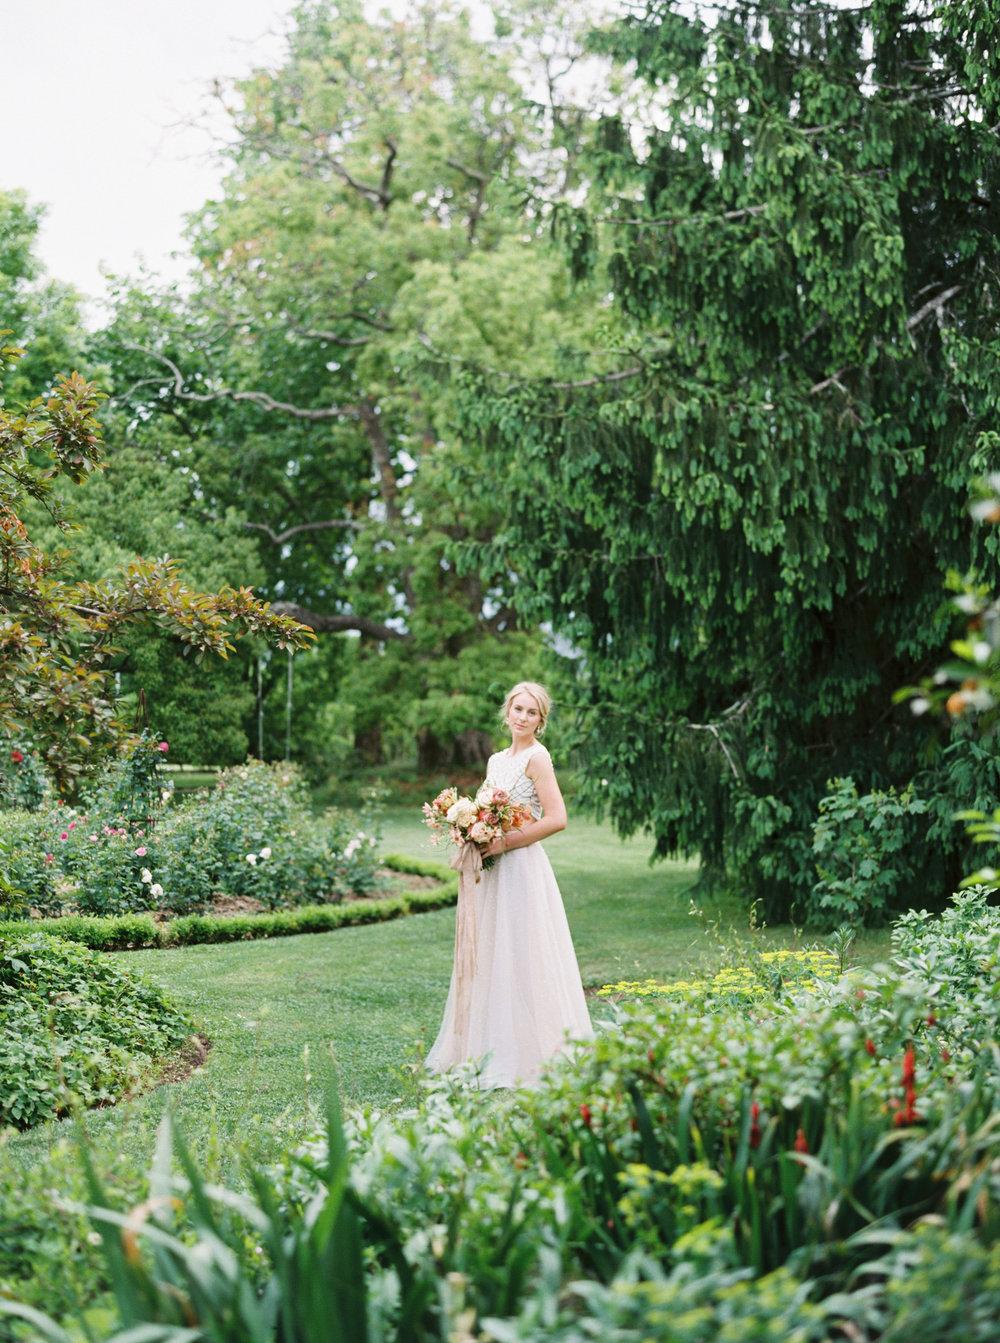 Timeless Southern Highland Wedding Elopement in Bowral NSW Fine Art Film Photographer Sheri McMahon-30.jpg